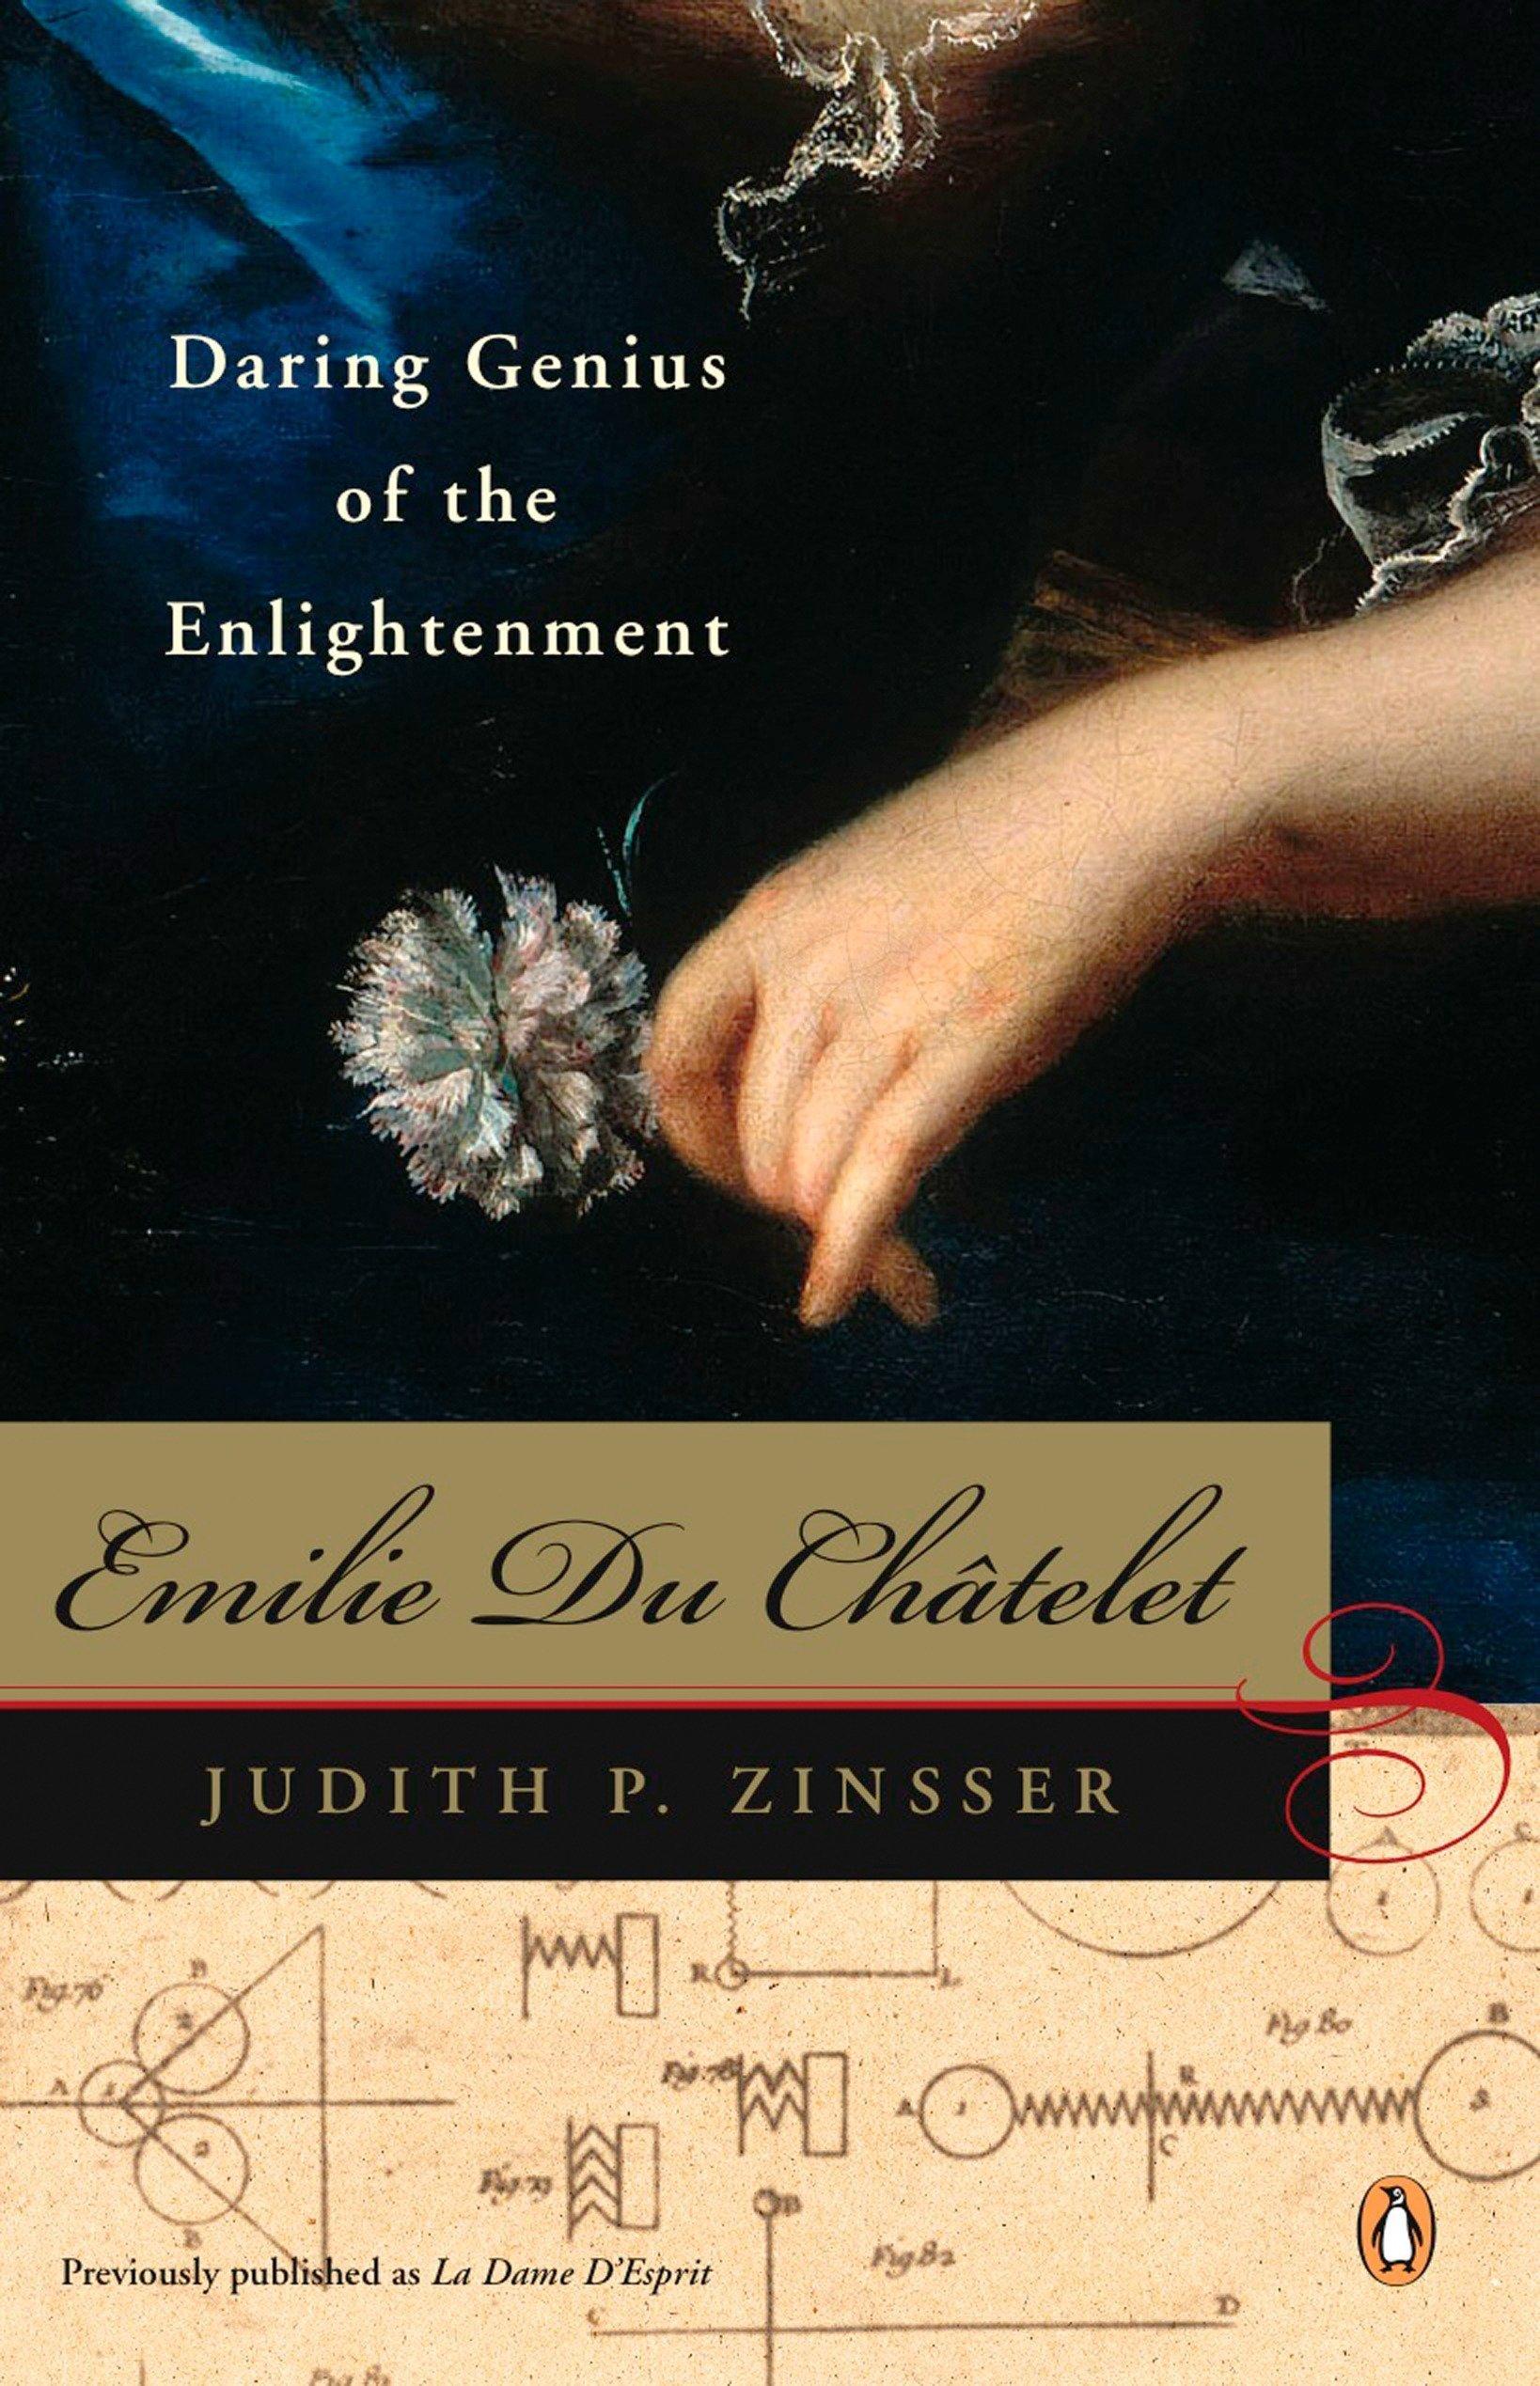 Amazon.com: Emilie Du Chatelet: Daring Genius of the Enlightenment  (9780143112686): Zinsser, Judith P.: Books